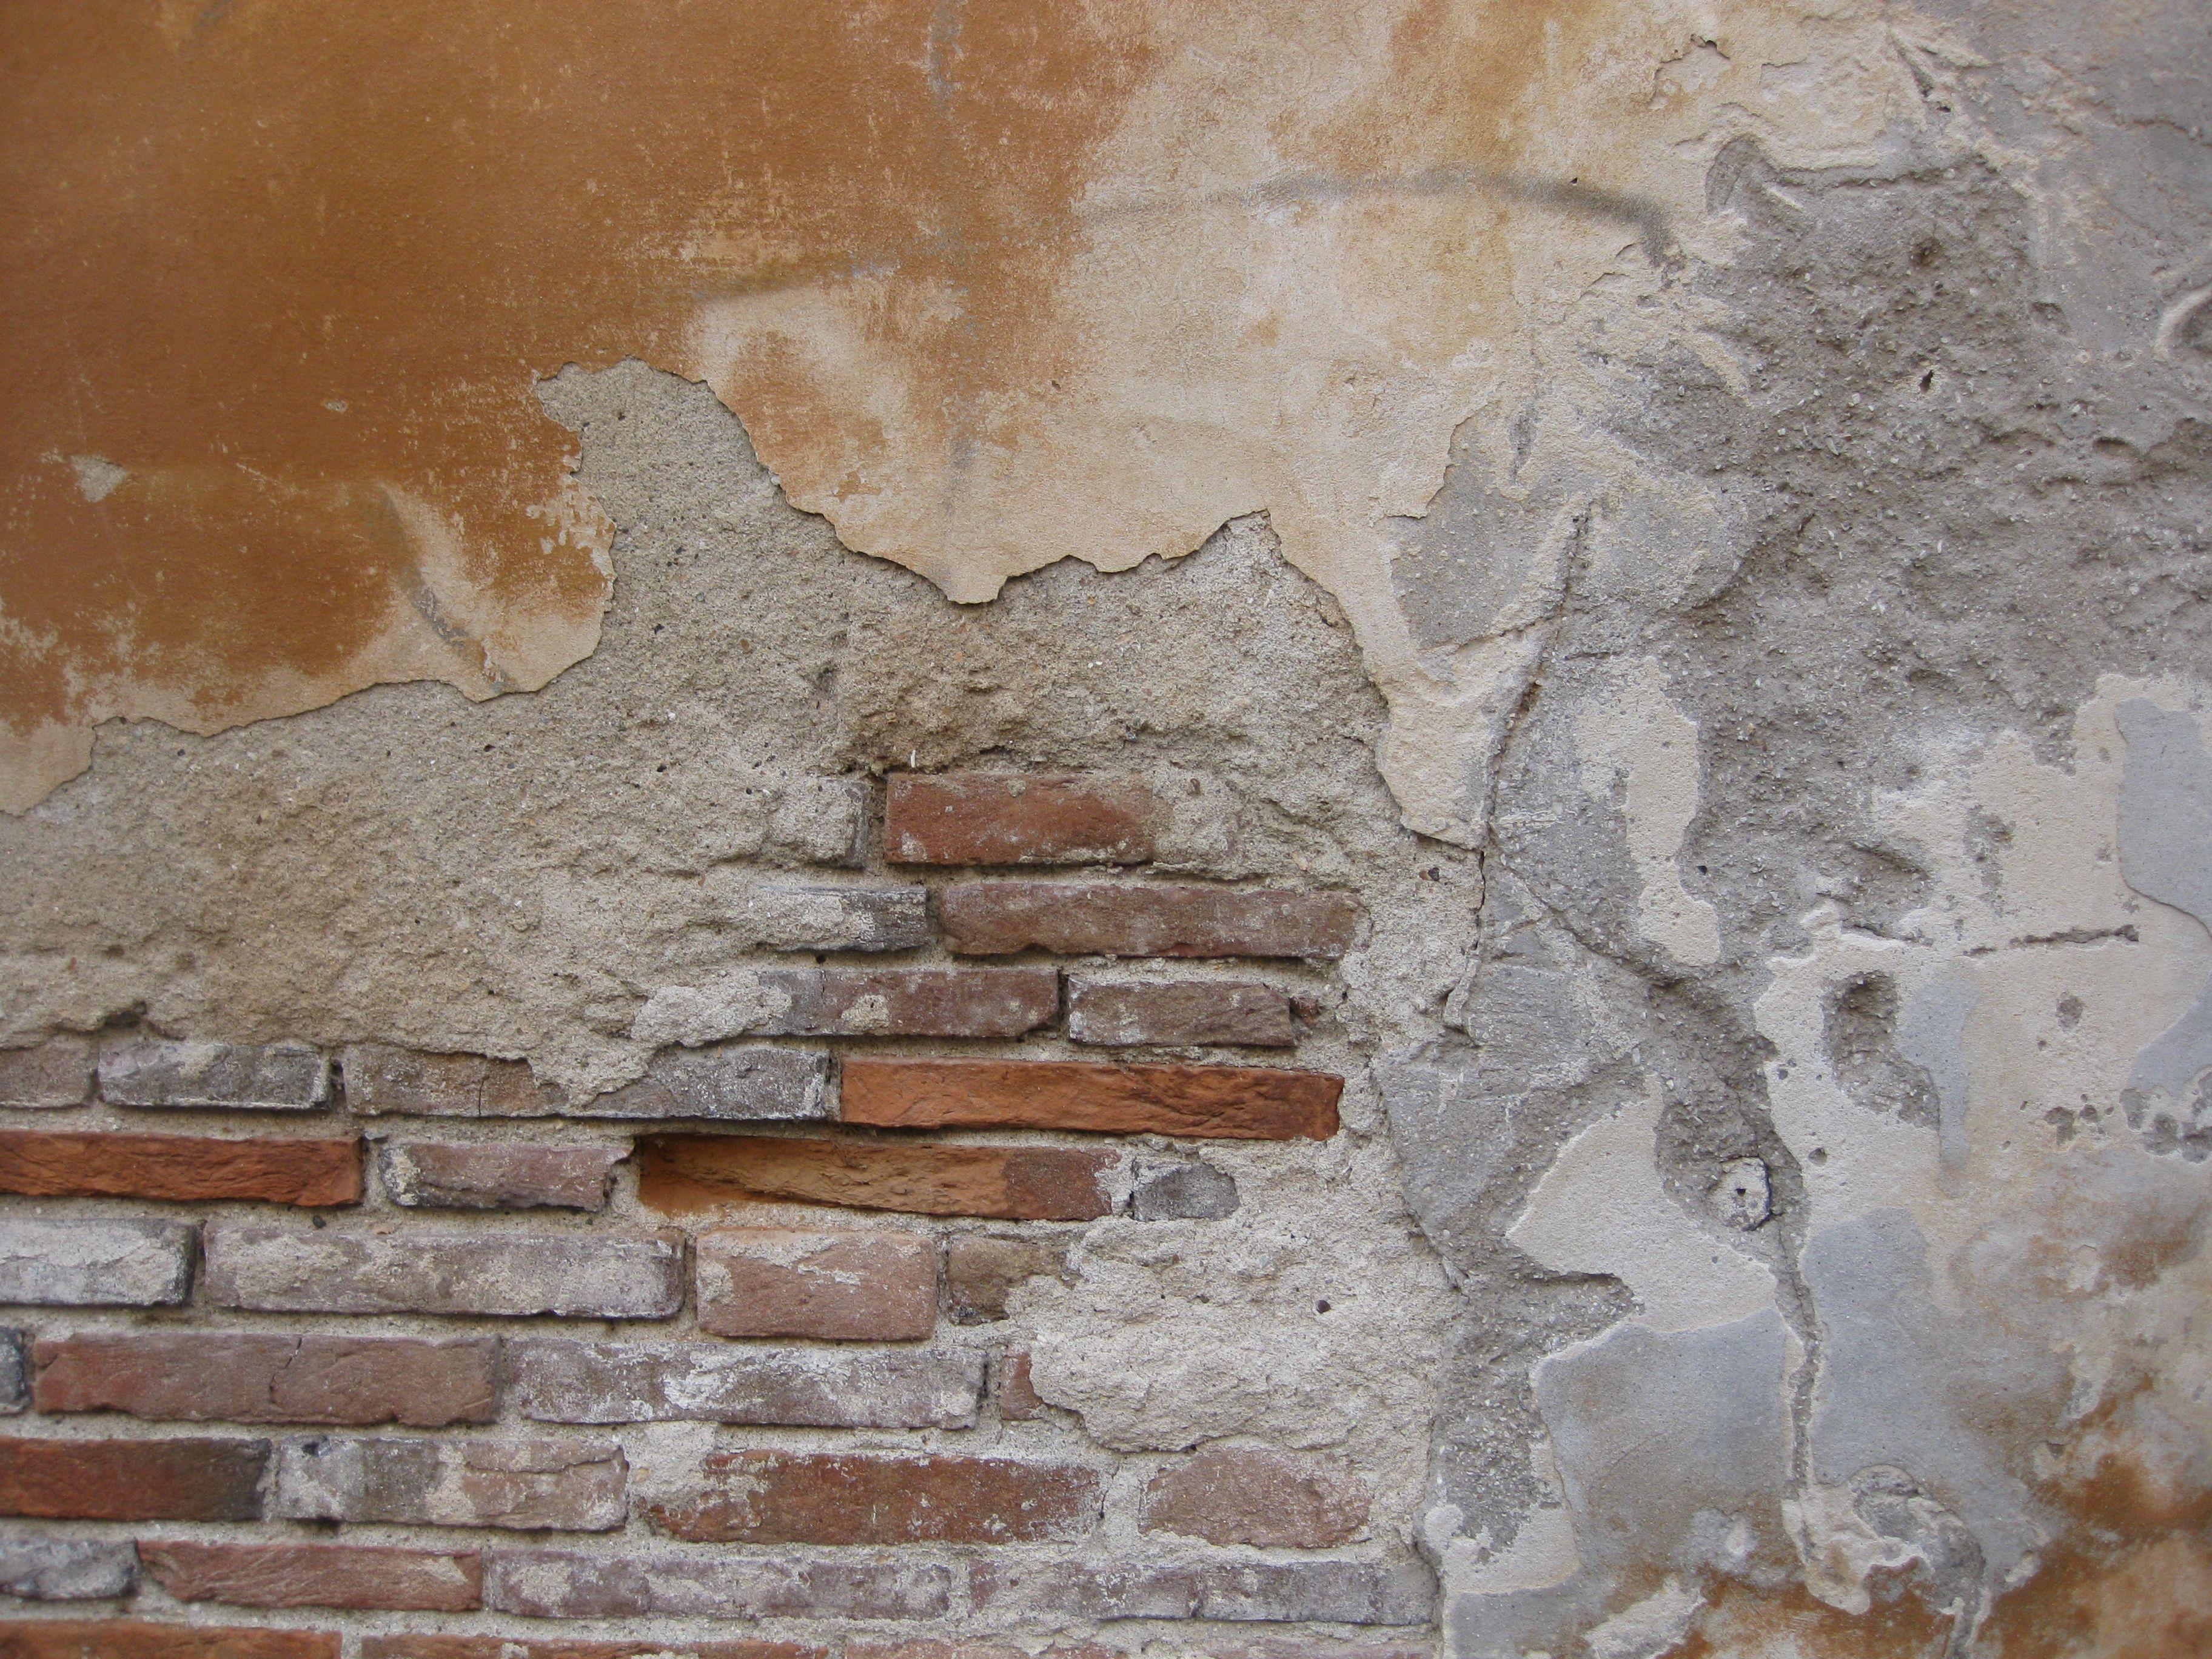 CRUMBLING BRICK WALL PLASTER Brick Wall Pinterest Bricks Plaster And